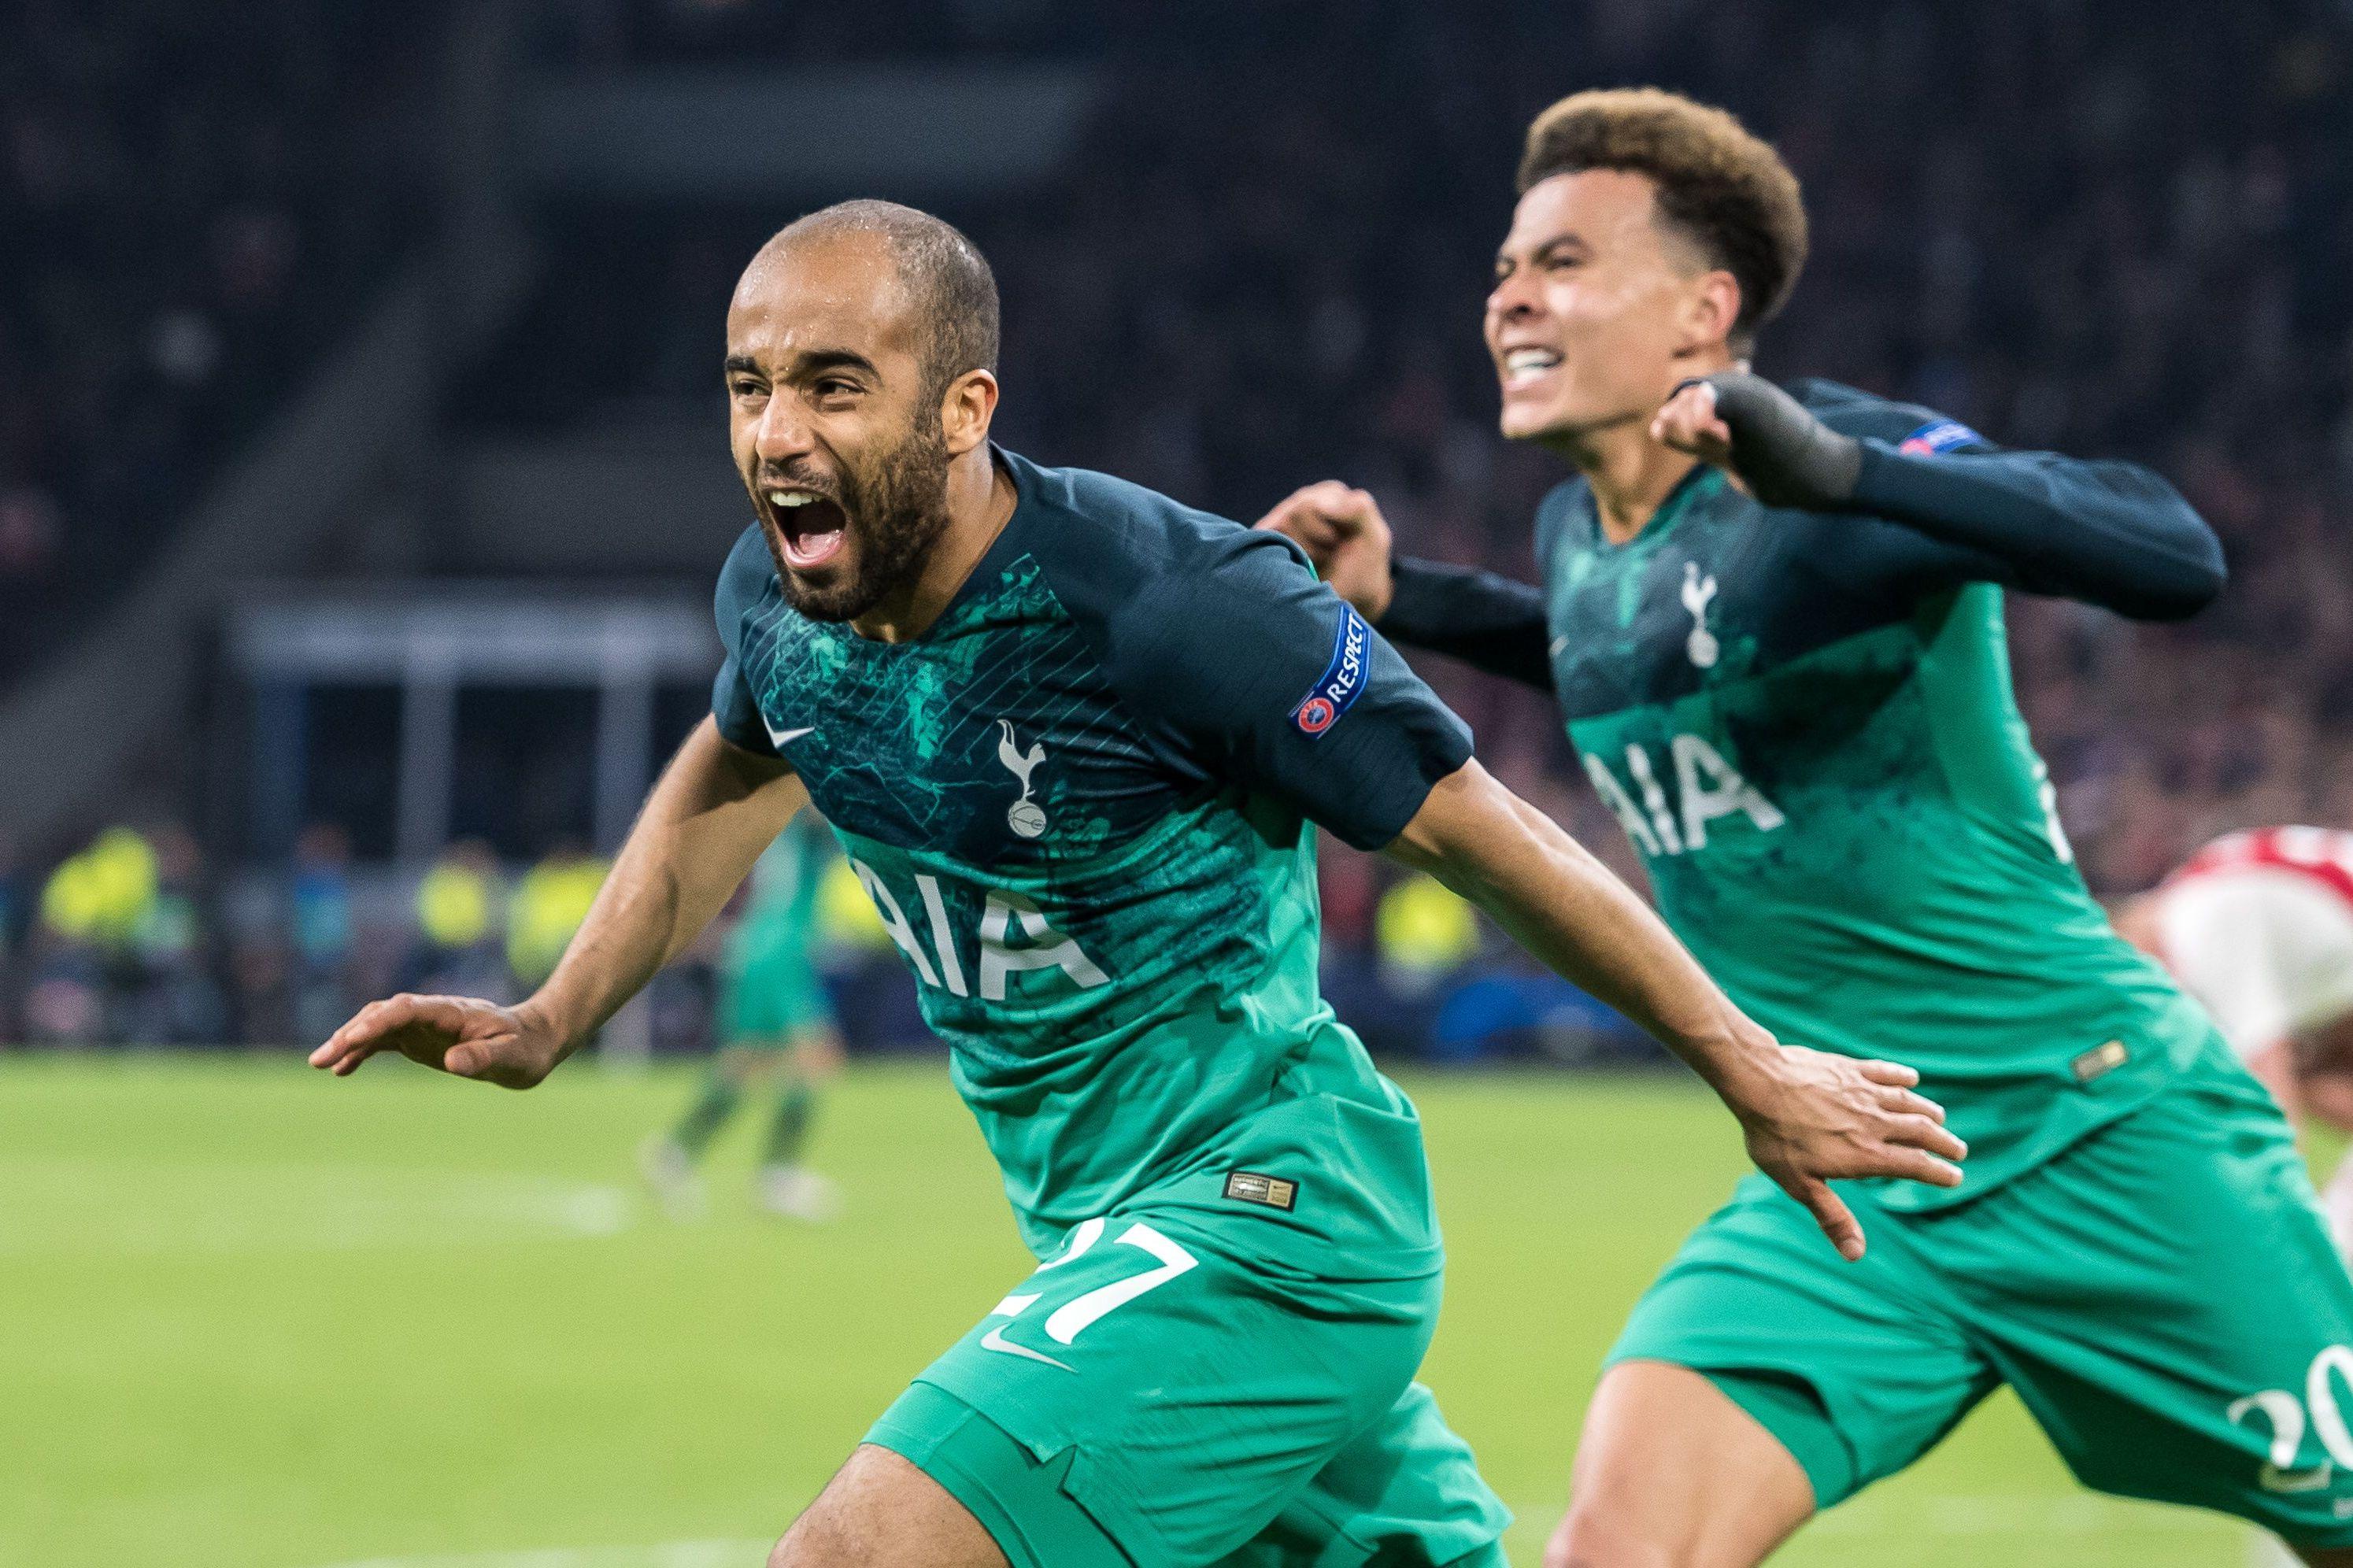 Champions League Final 2019: Date, Venue, Predictions for